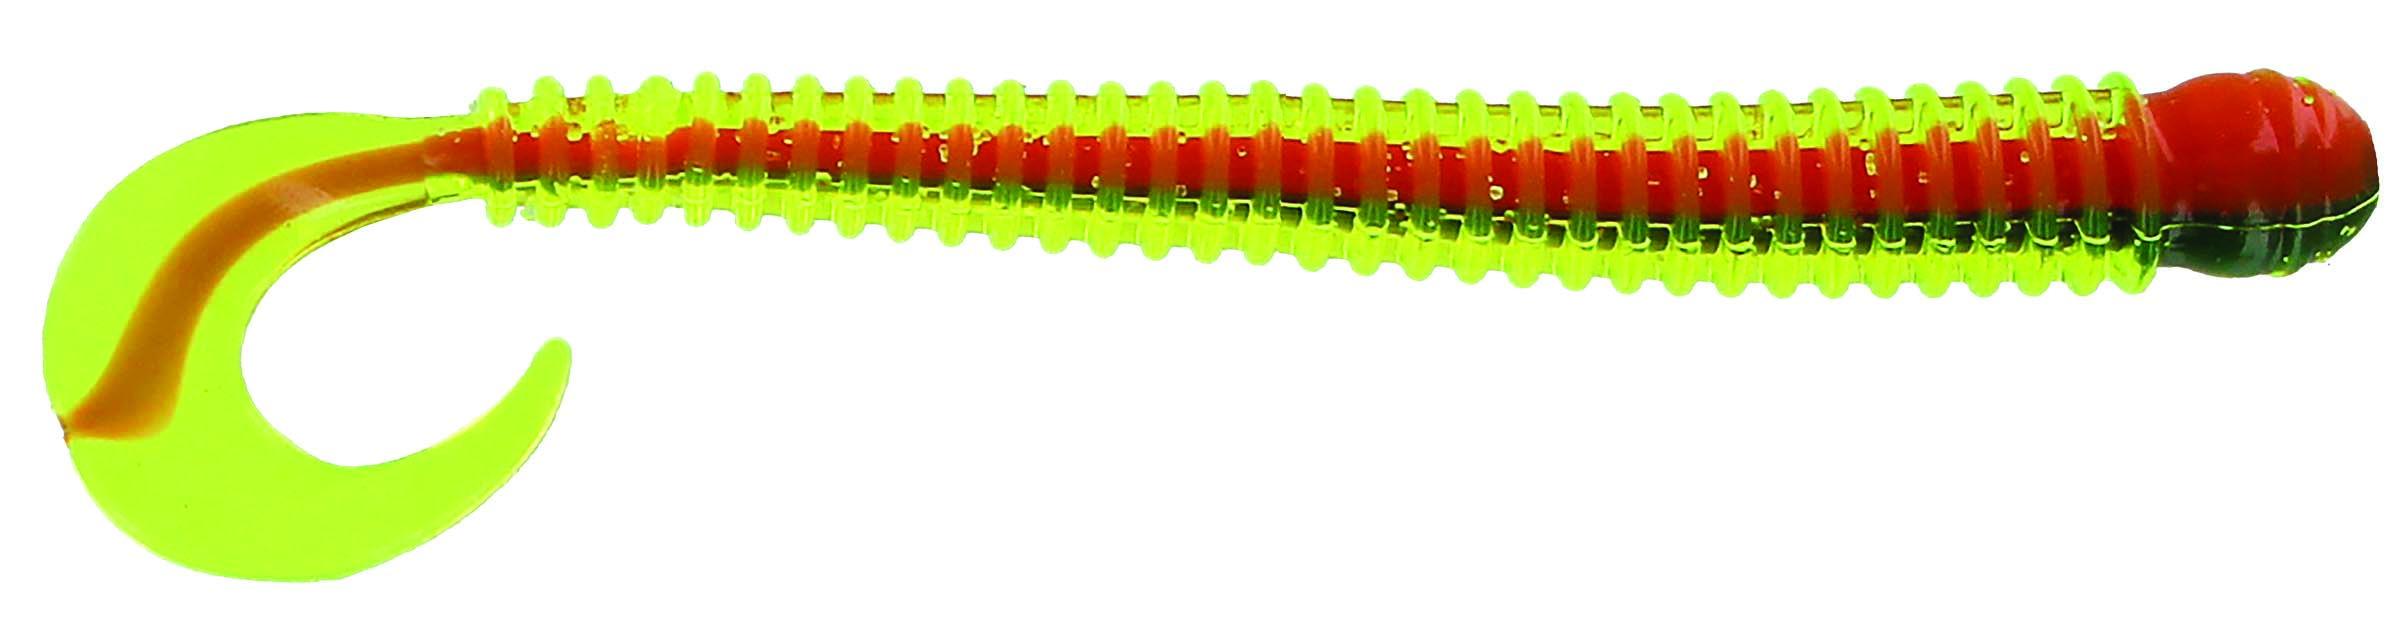 Big Bite Baits - Disc Ring Worm - 4 inch - RW-409 - FIRE TIGER